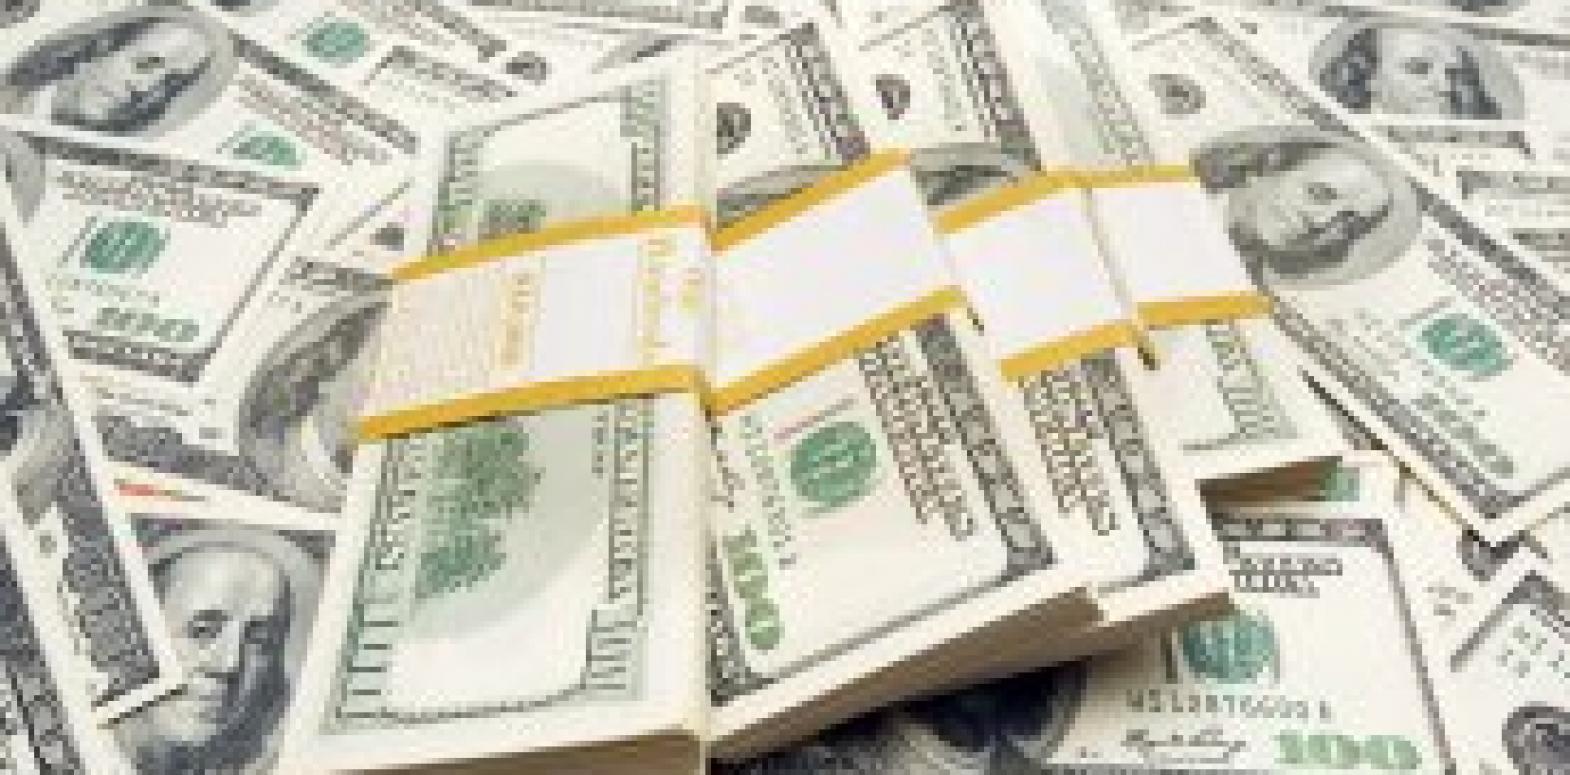 Наличный курс 31 марта: доллар - 27,87-28,45 грн, евро - 30,45-31,34 грн